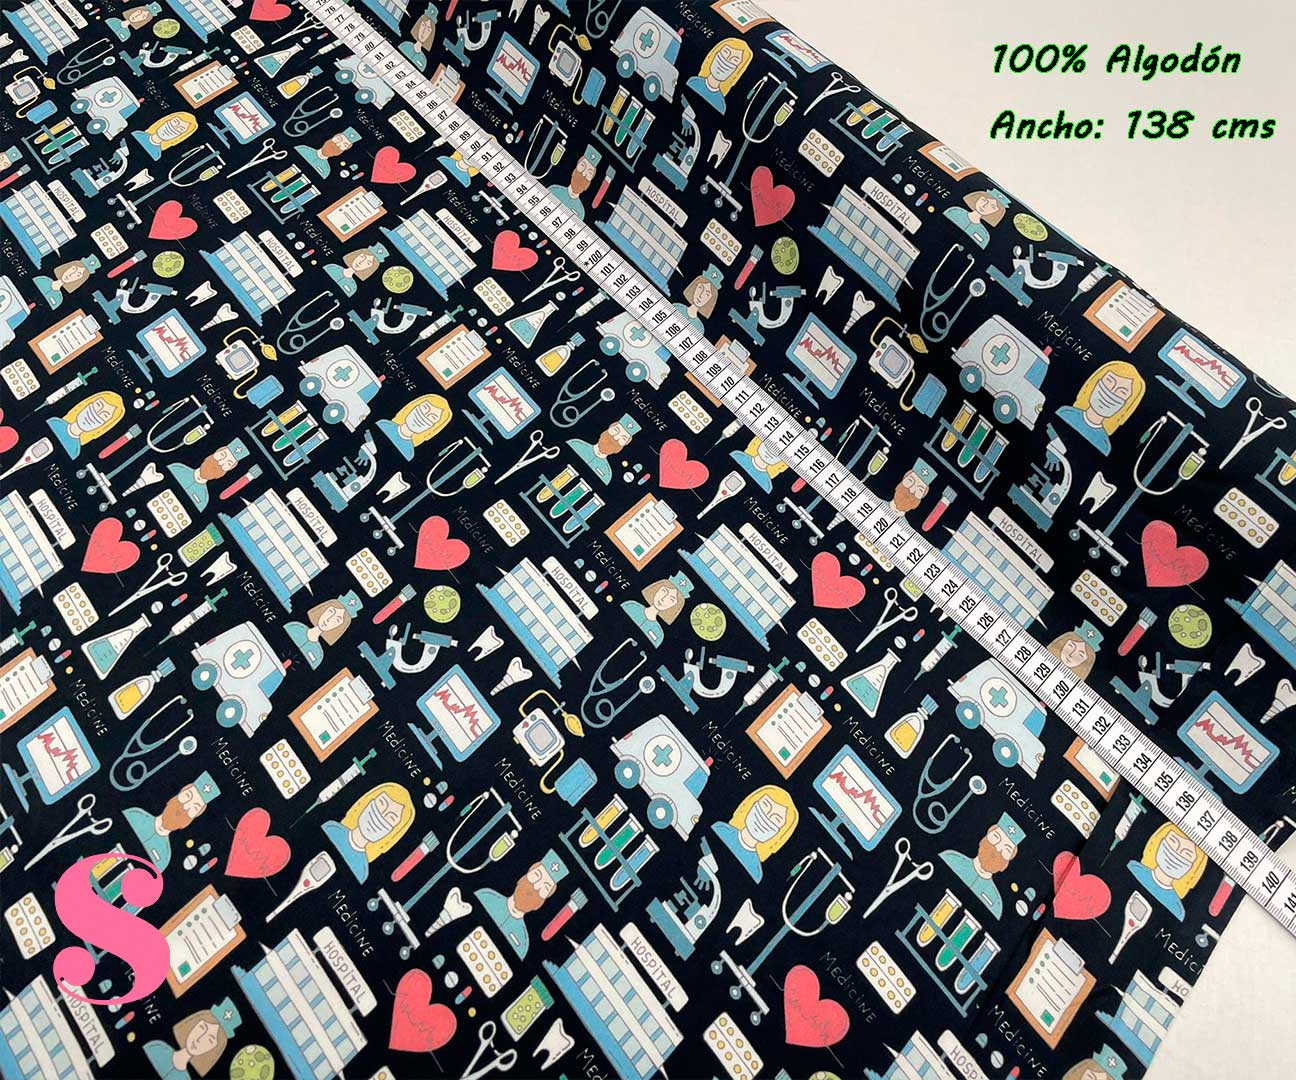 1-telas-de-algodón-estampadas,-telas-para-sanitarios,-telas-para-confeccionar-gorros-sanitarios,estampados-para-sanitarios,Tejido Estampado Medicina Hospital